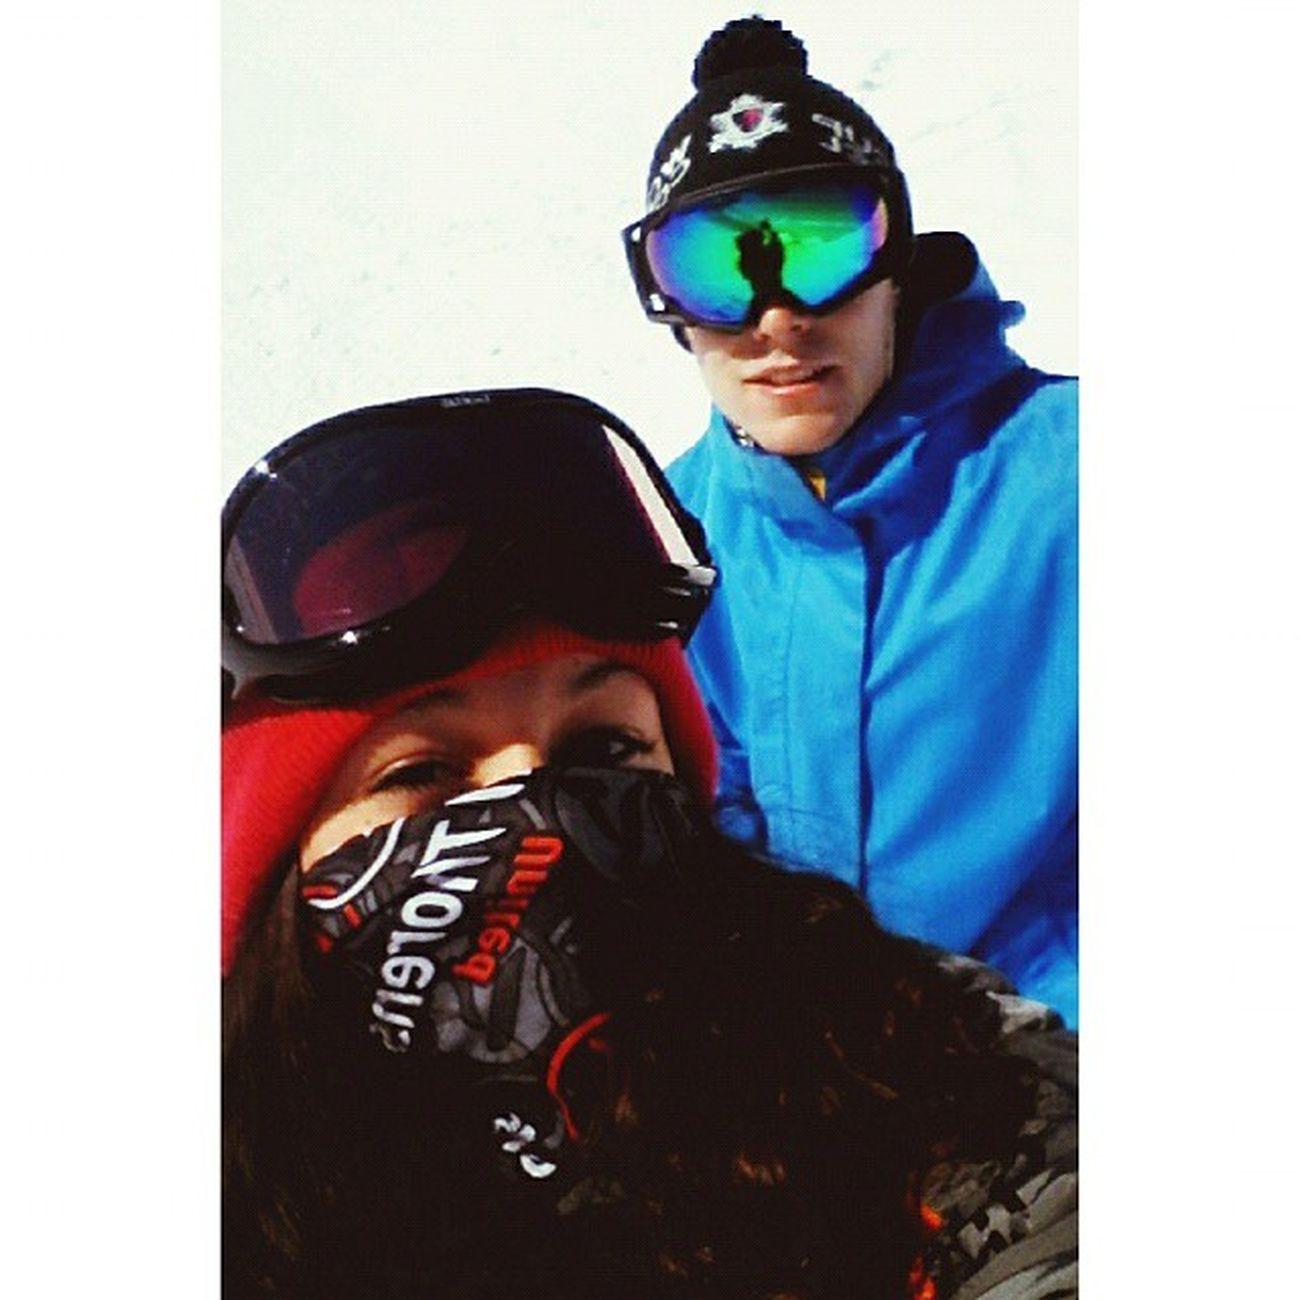 ❄💏🎿 Skiingday Lesmenuires ValThorens  Pasdetouristescestlekiff